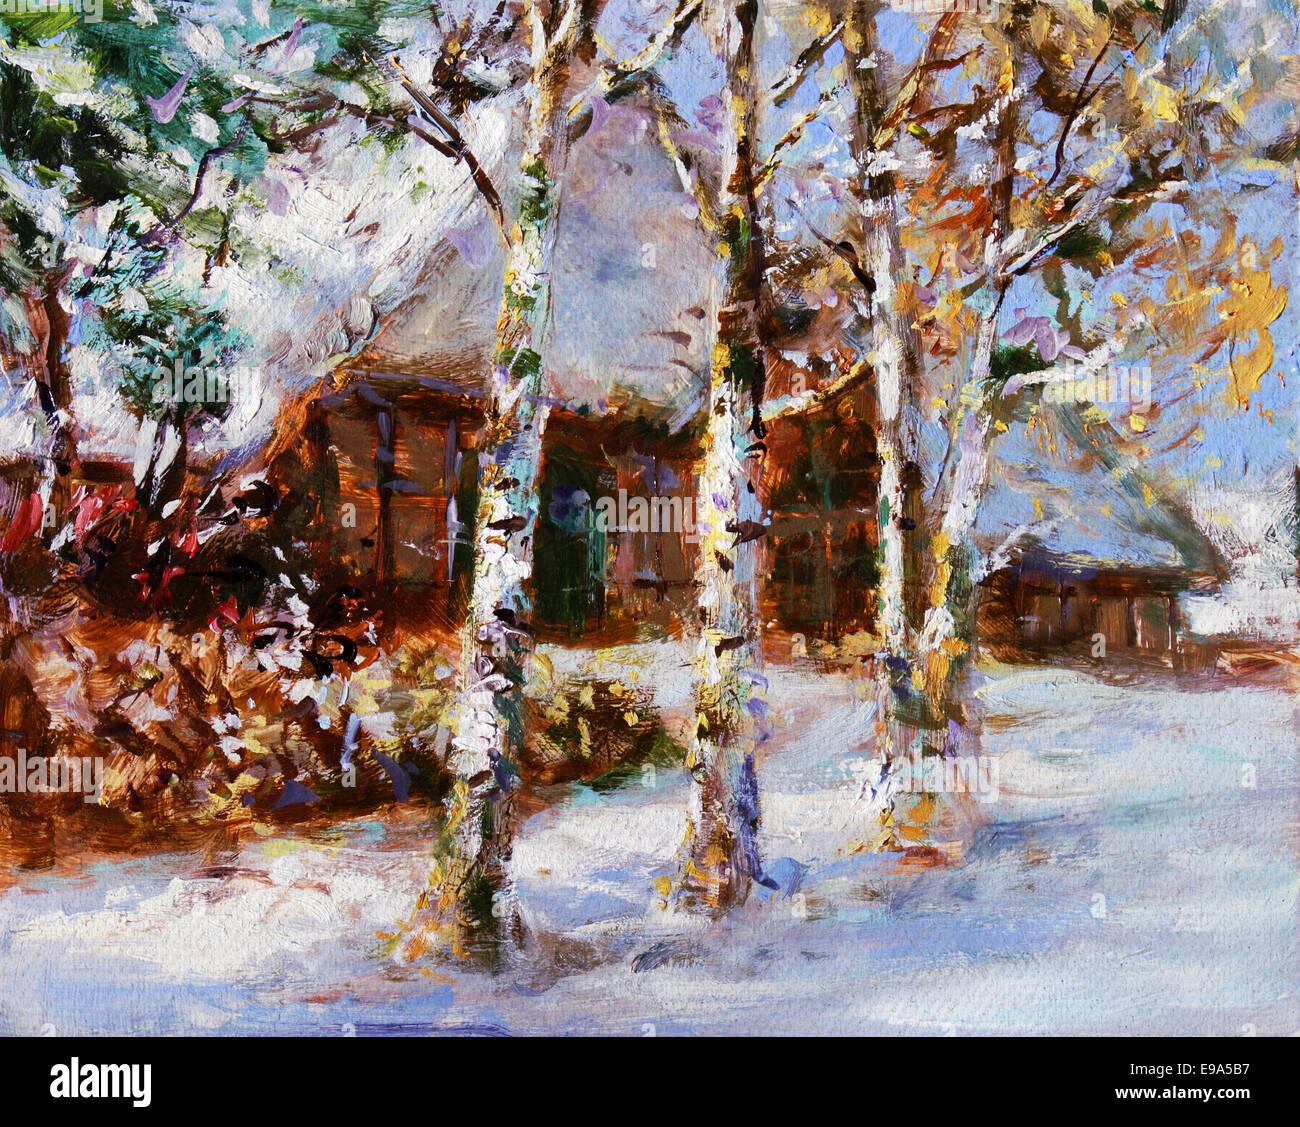 sunny winter landscape - painting - Stock Image